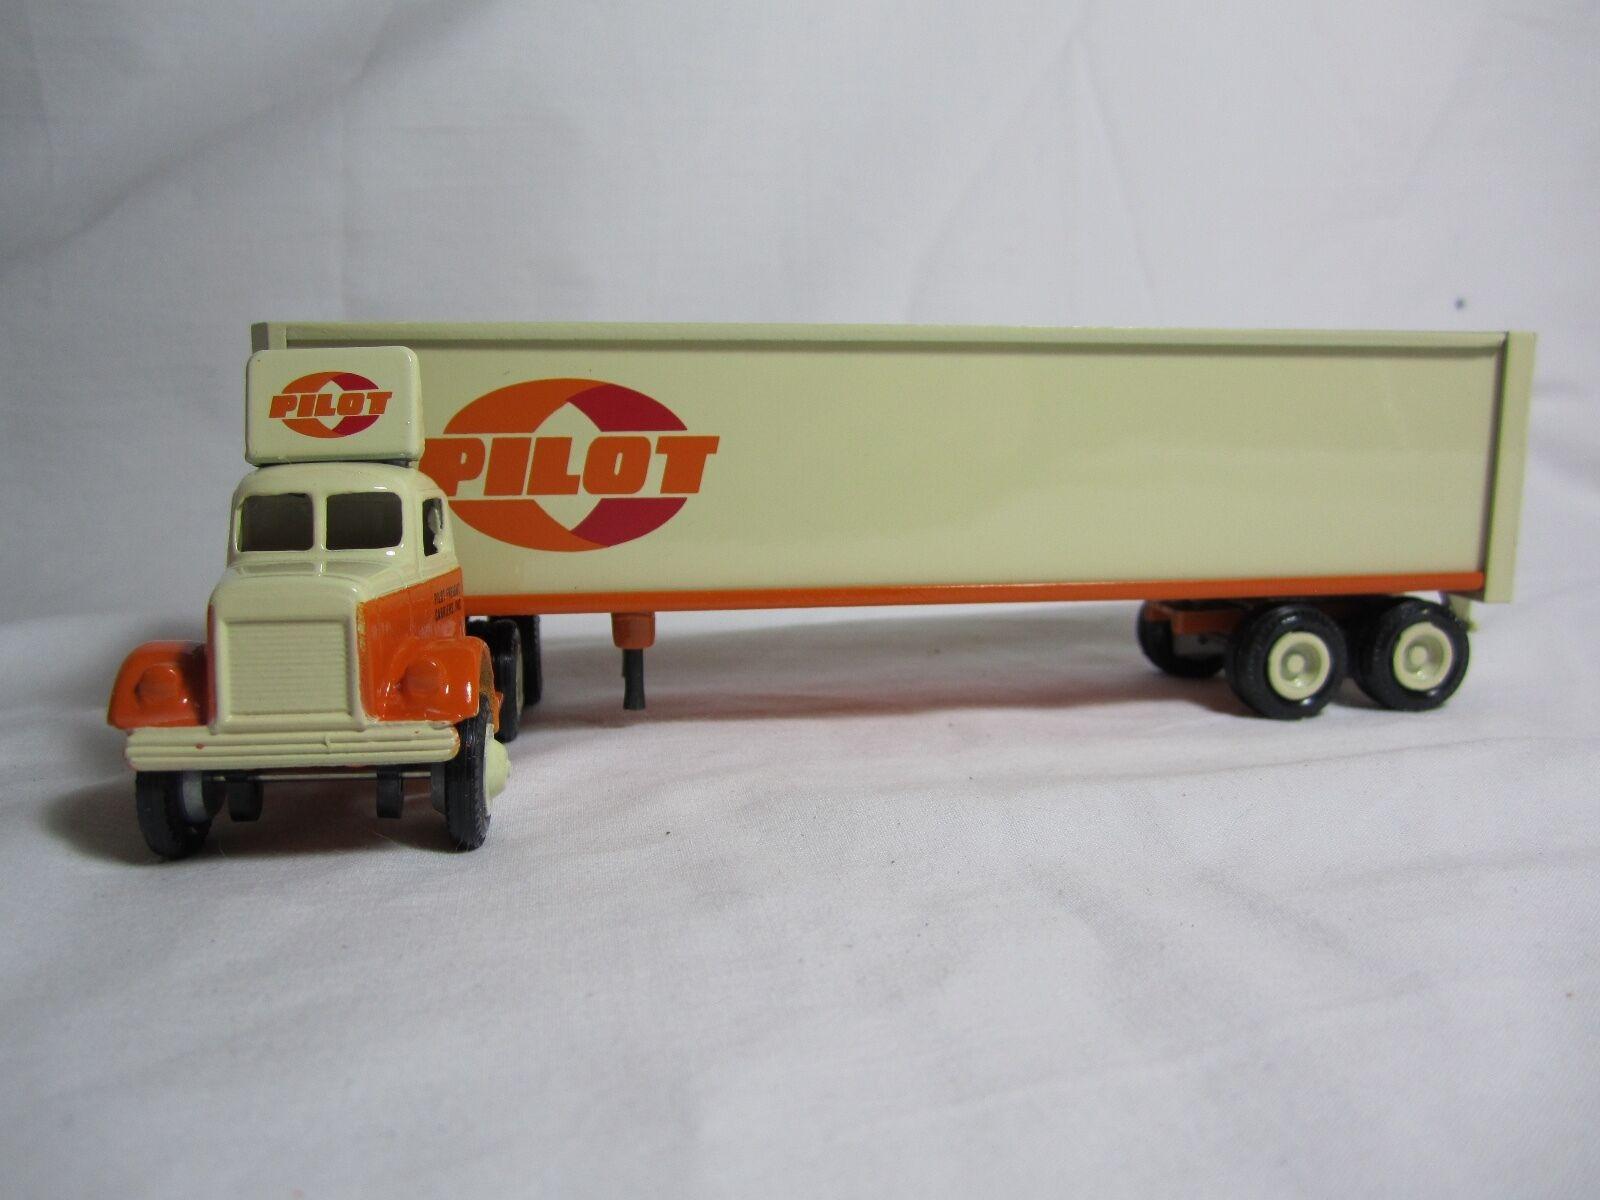 Winross 1982 PILOT FREIGHT CARRIERS White 9000 Cargo Truck